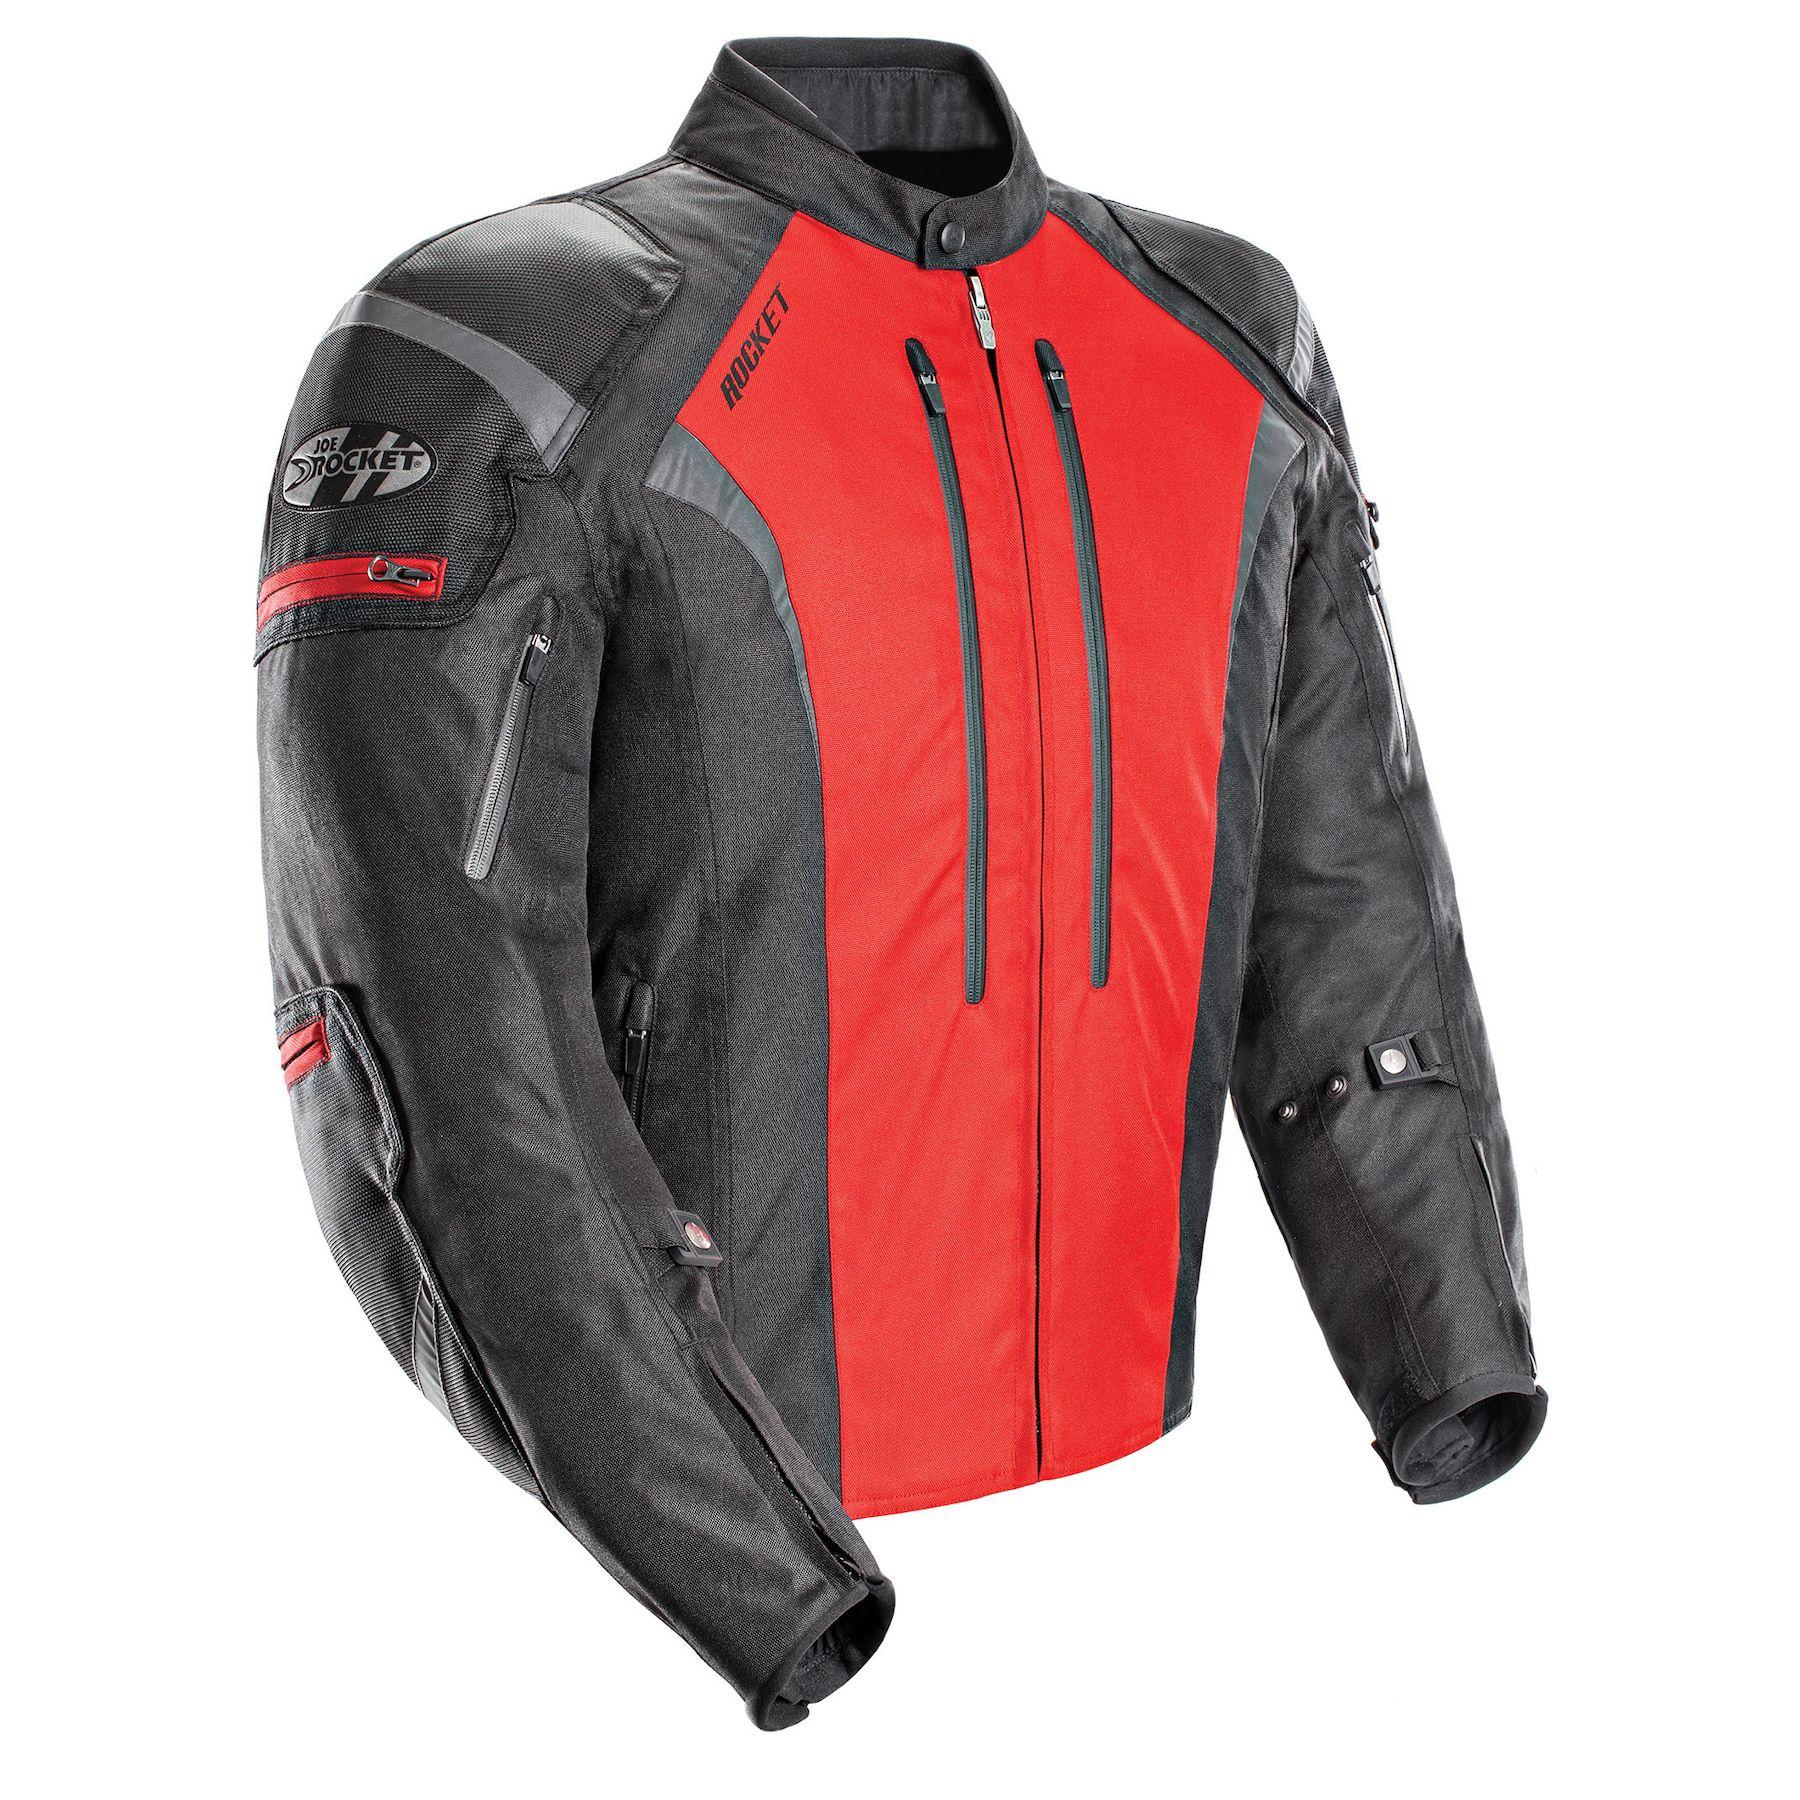 Joe Rocket Atomic 5.0 Textile Jacket